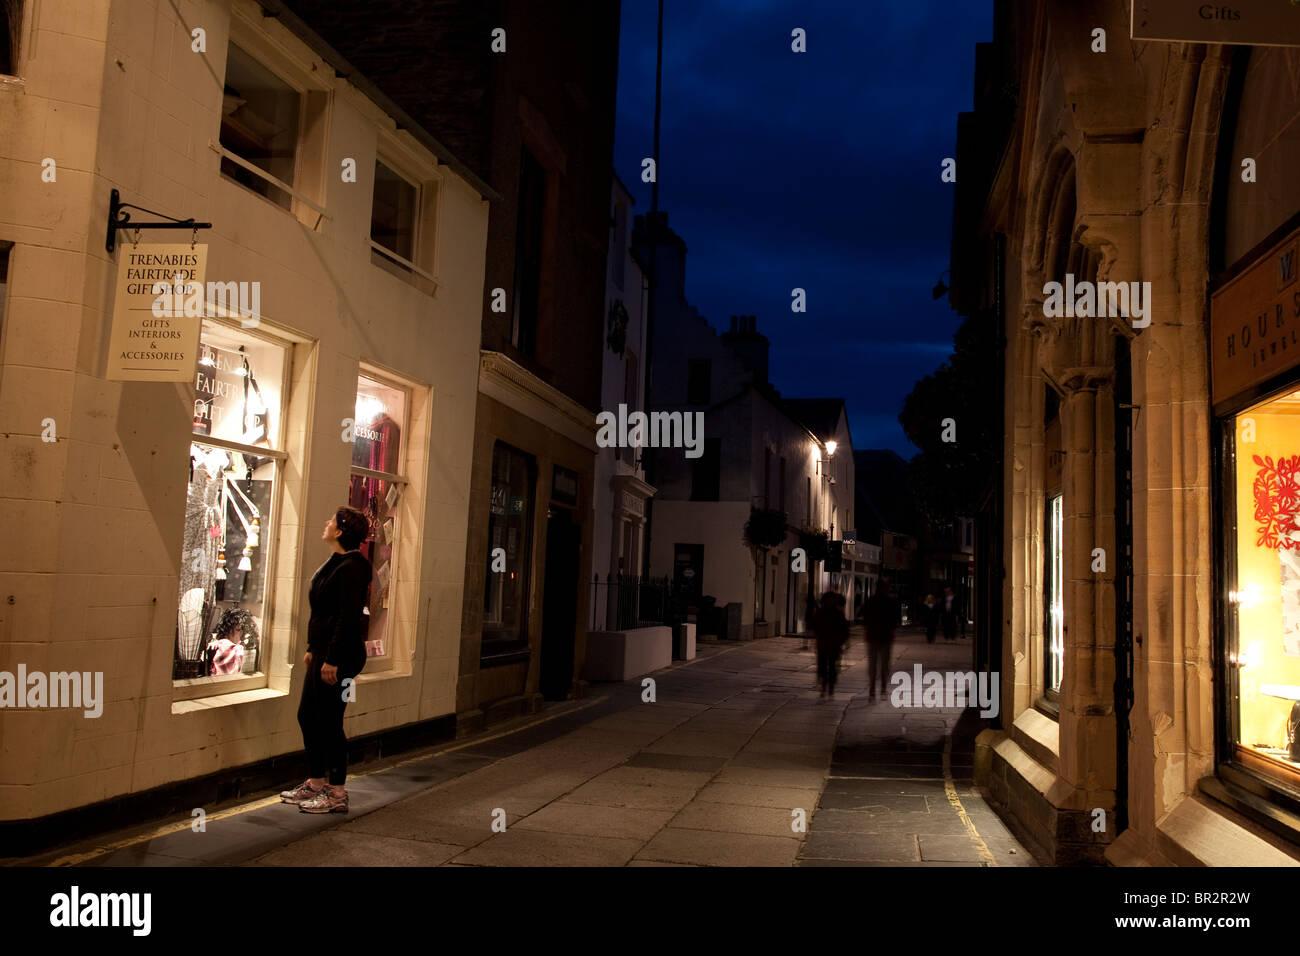 Albert Street, Kirkwall, Orkney Islands, Scotland illuminated at night - Stock Image